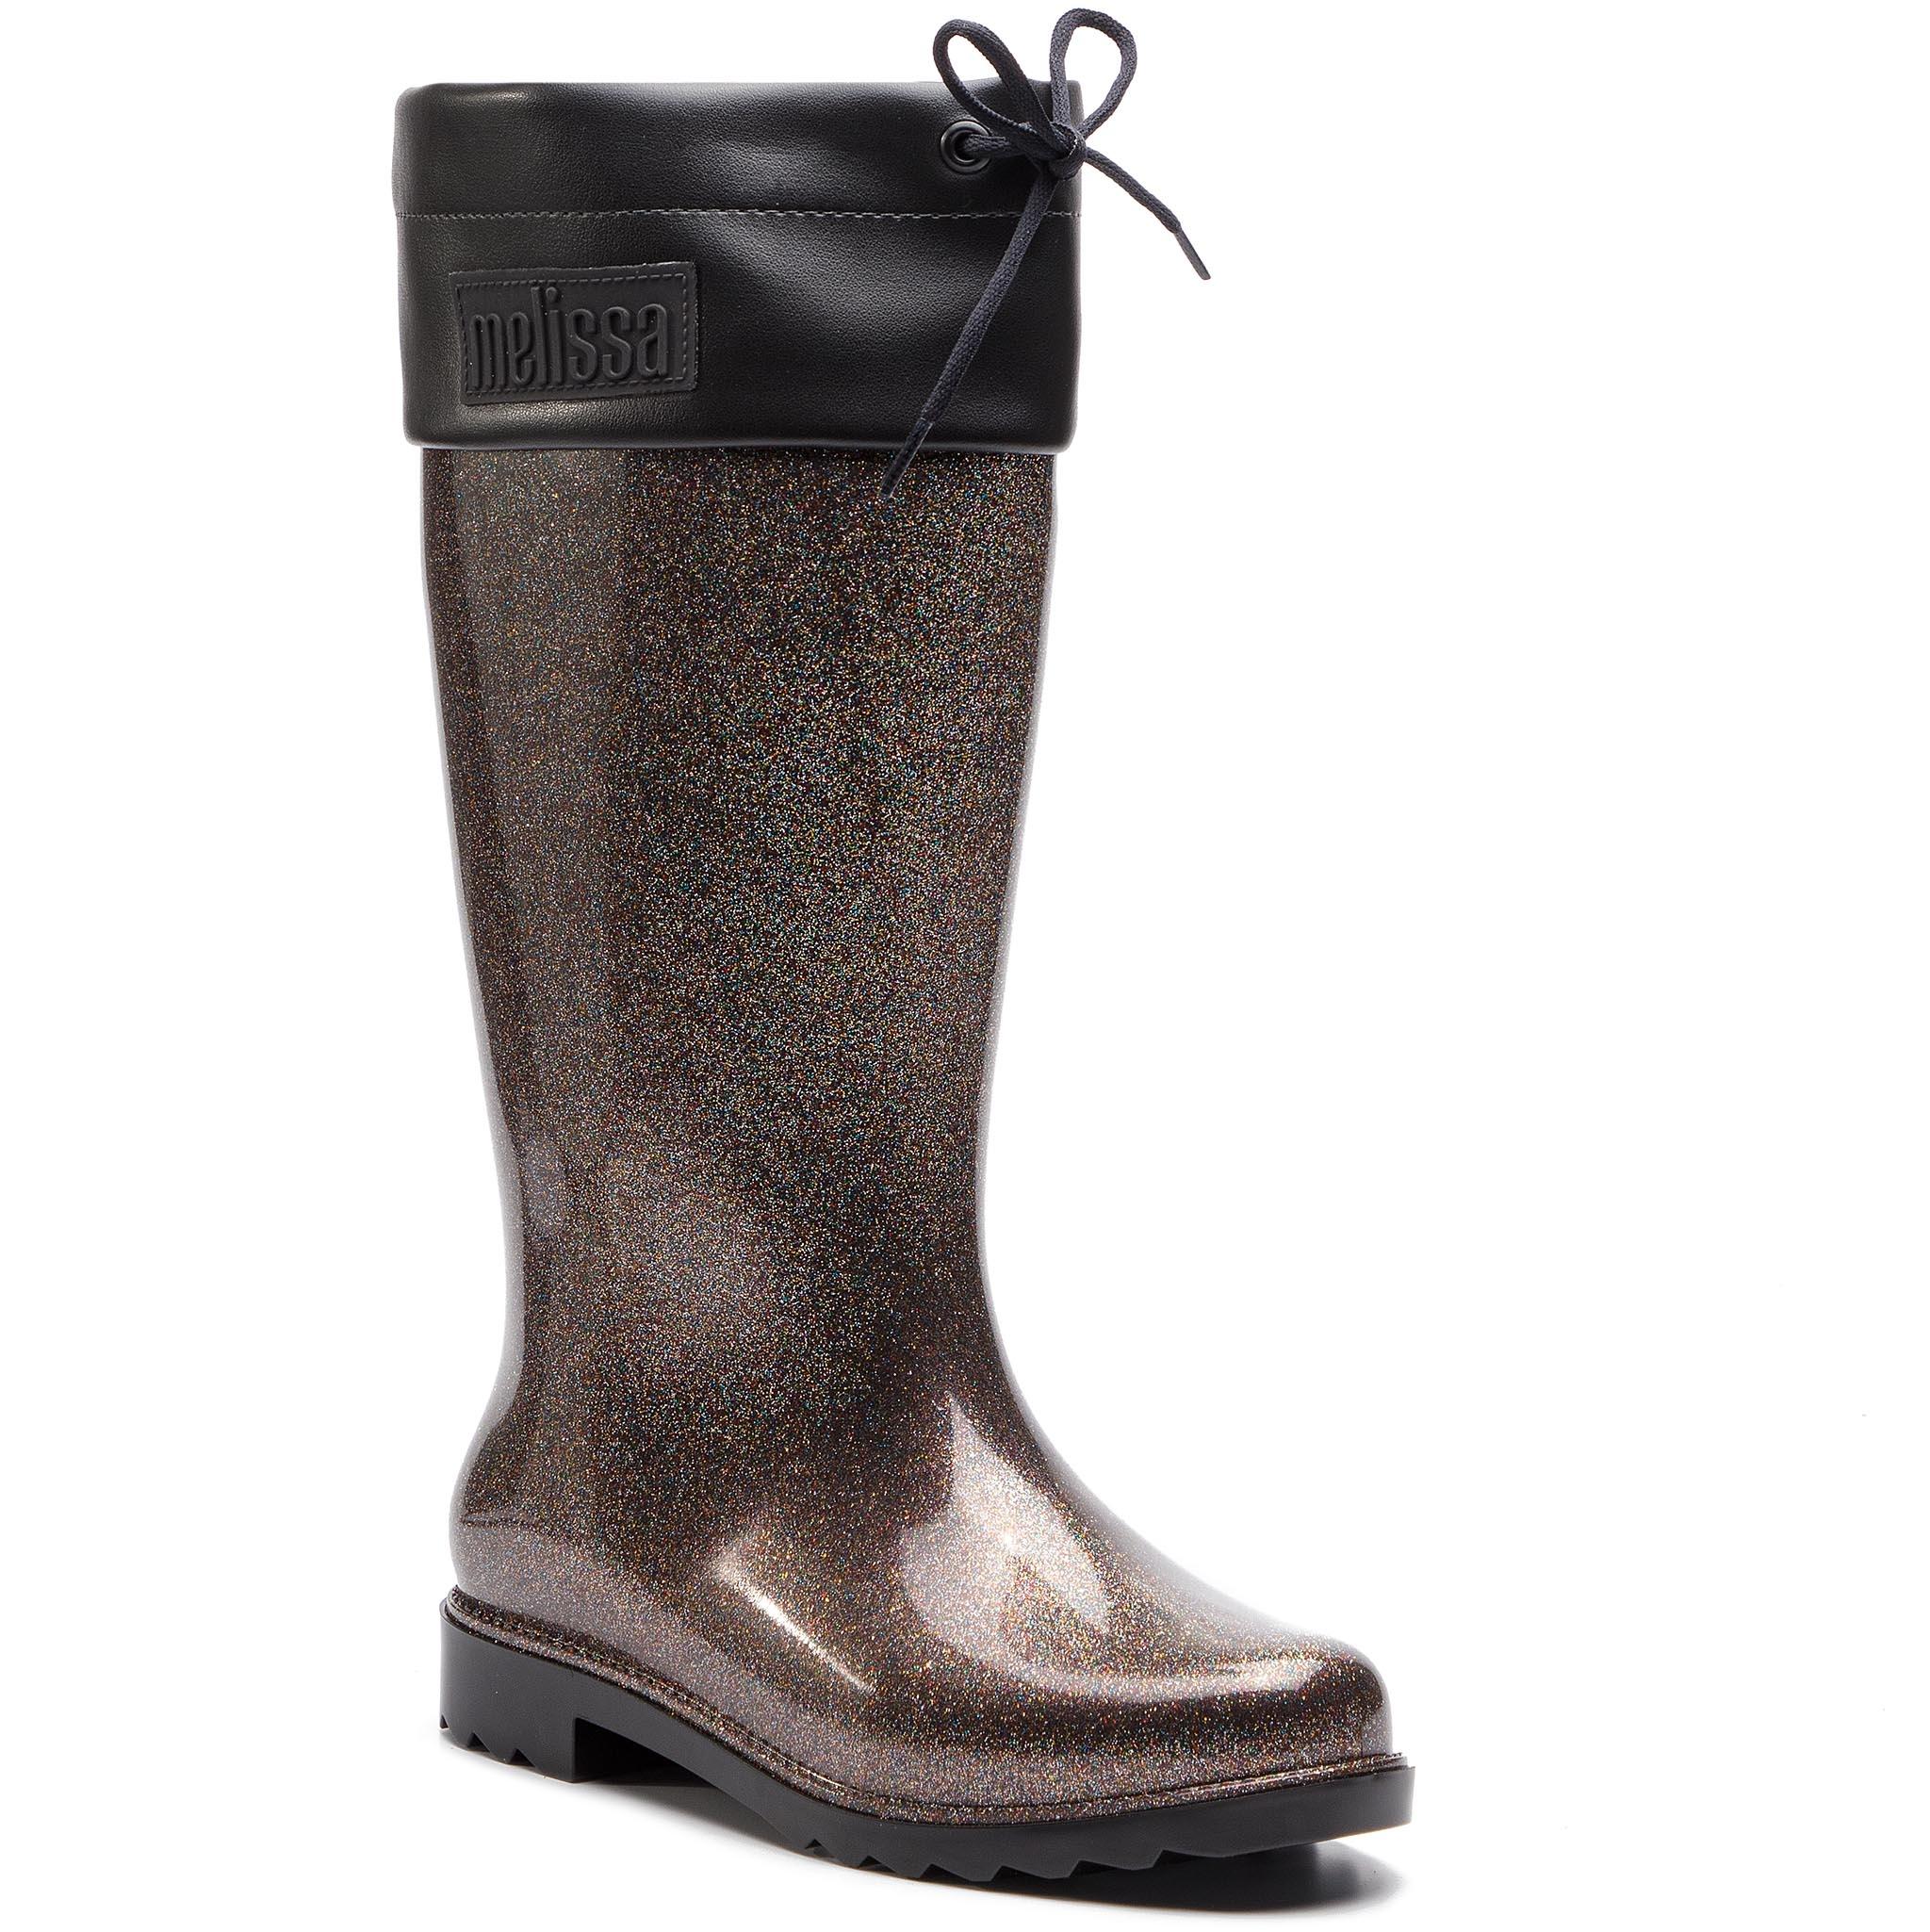 dd546e86c6d7 ... MELISSA - Rain Boot Ad 32422 Black Glitter 52324. -20%. Γαλότσες ...